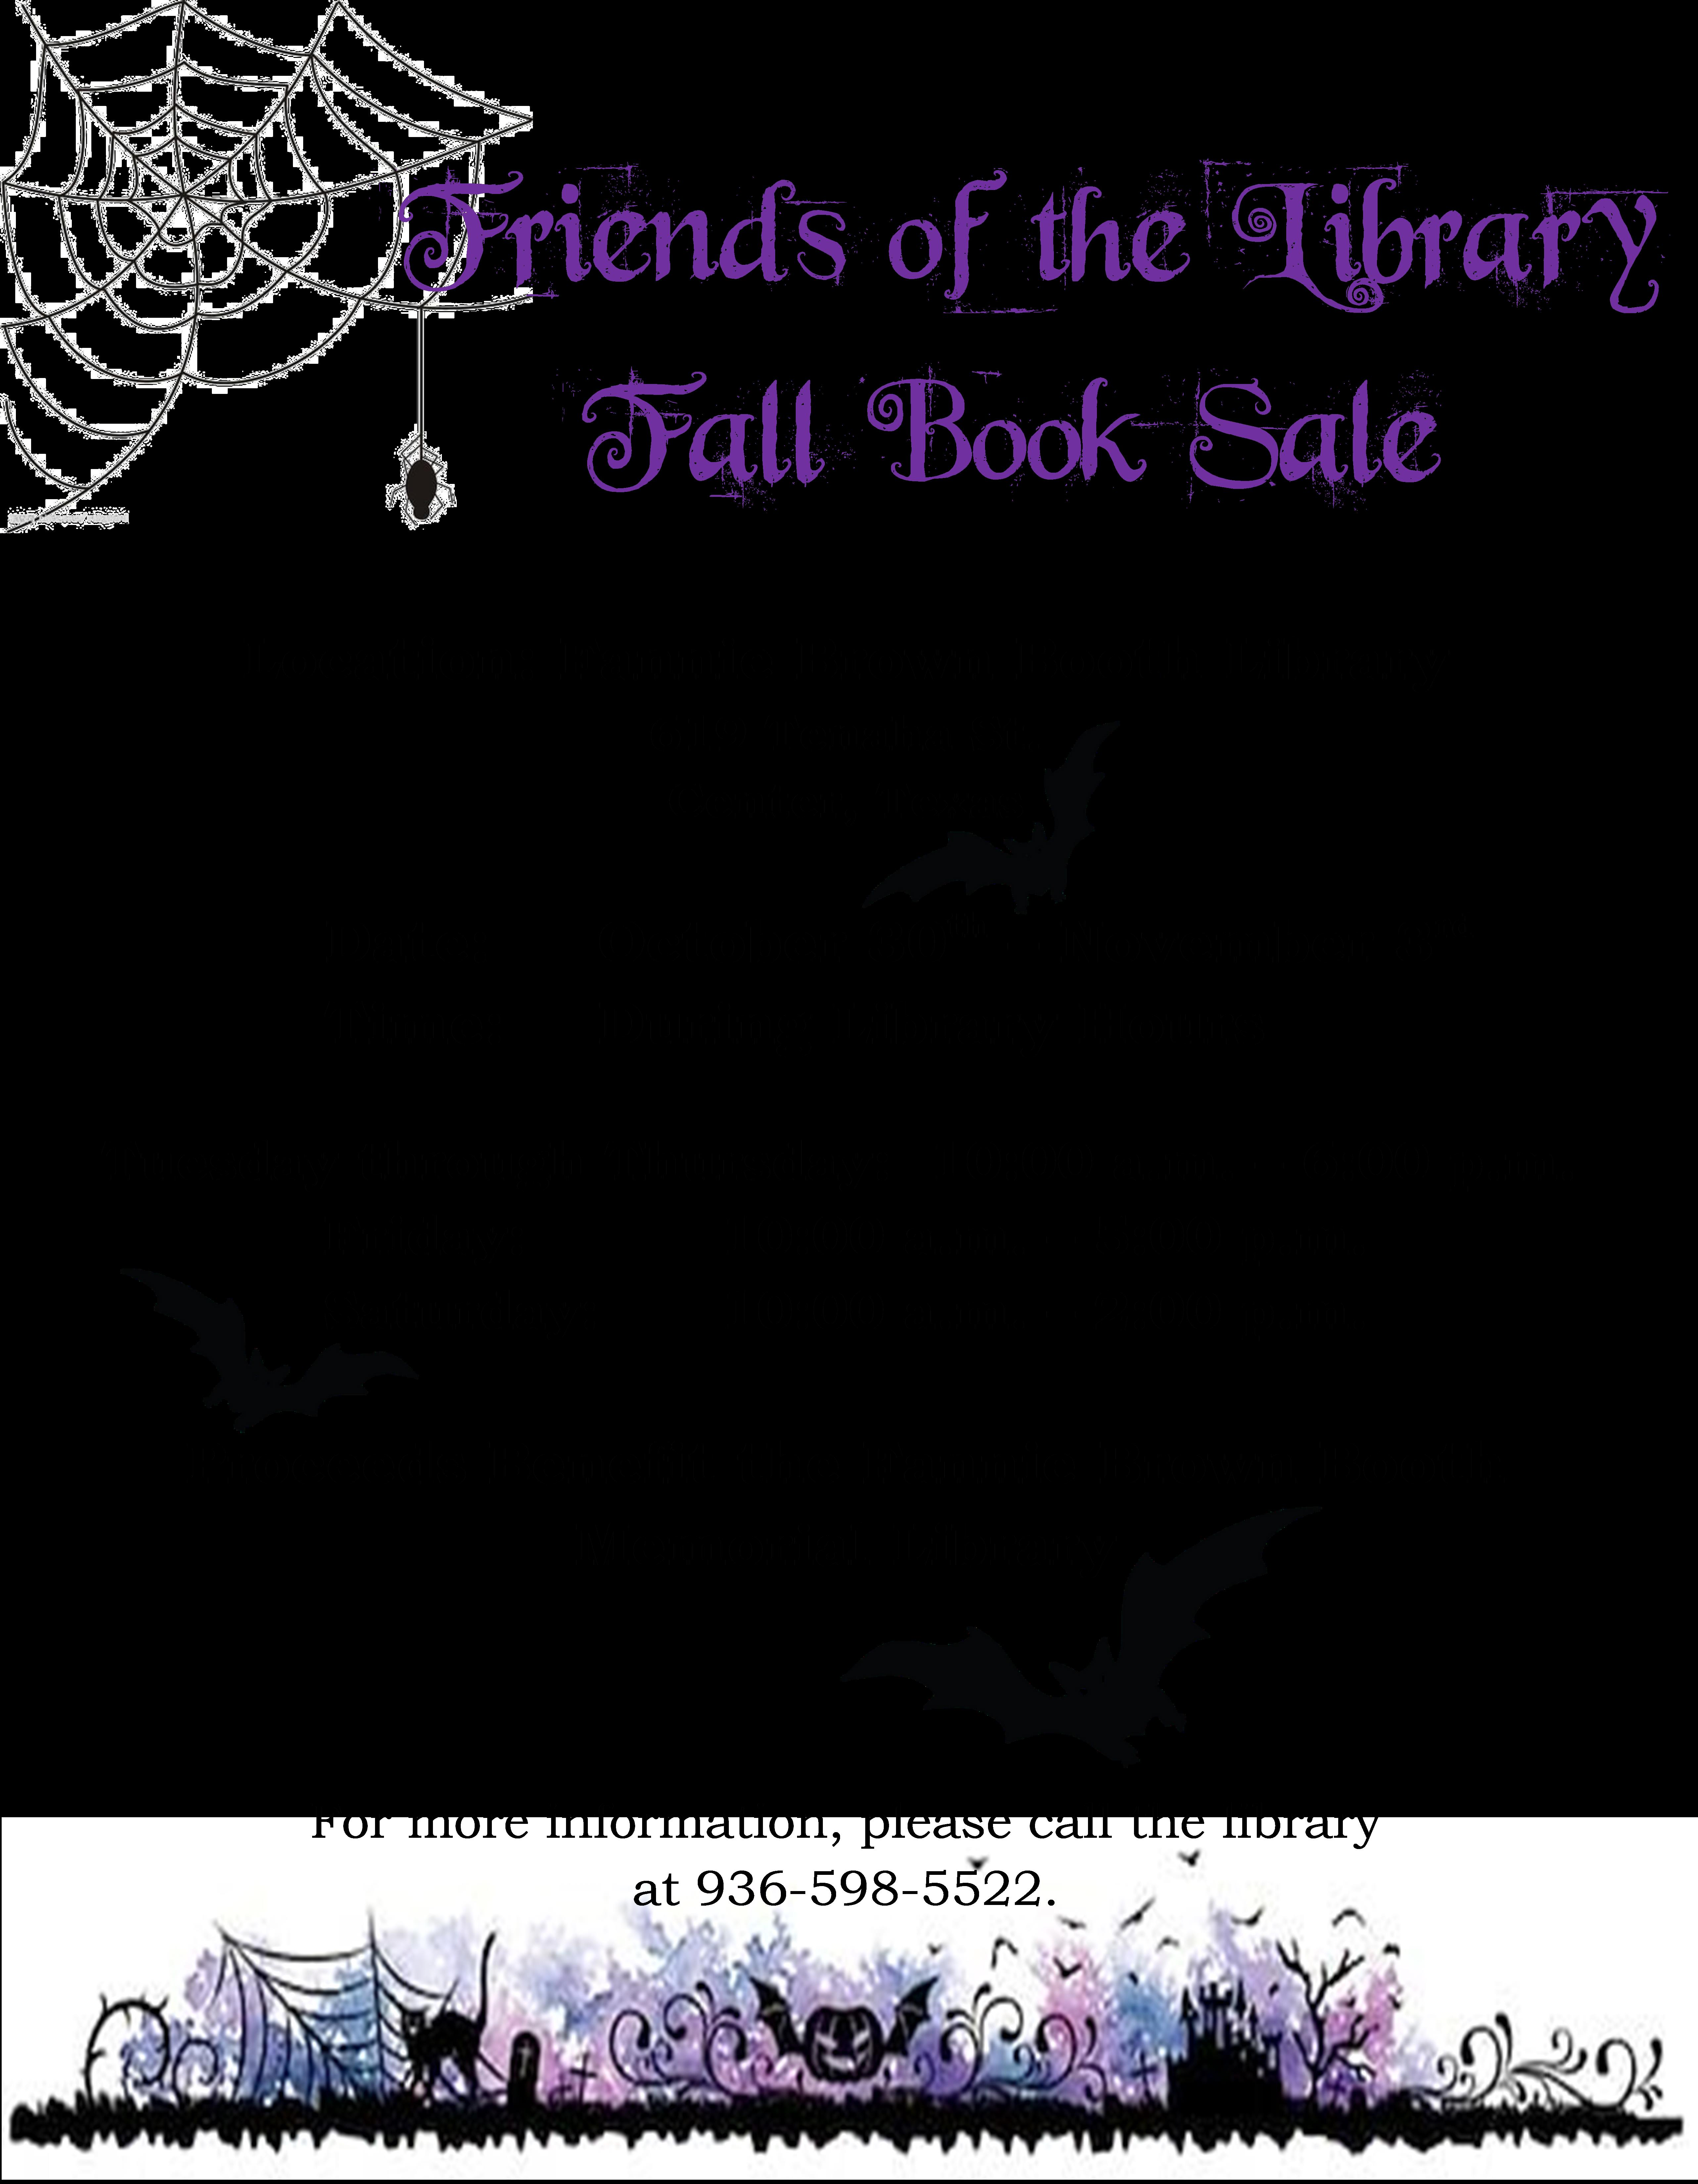 Fall Book Sale 2018 Pic Format.jpg